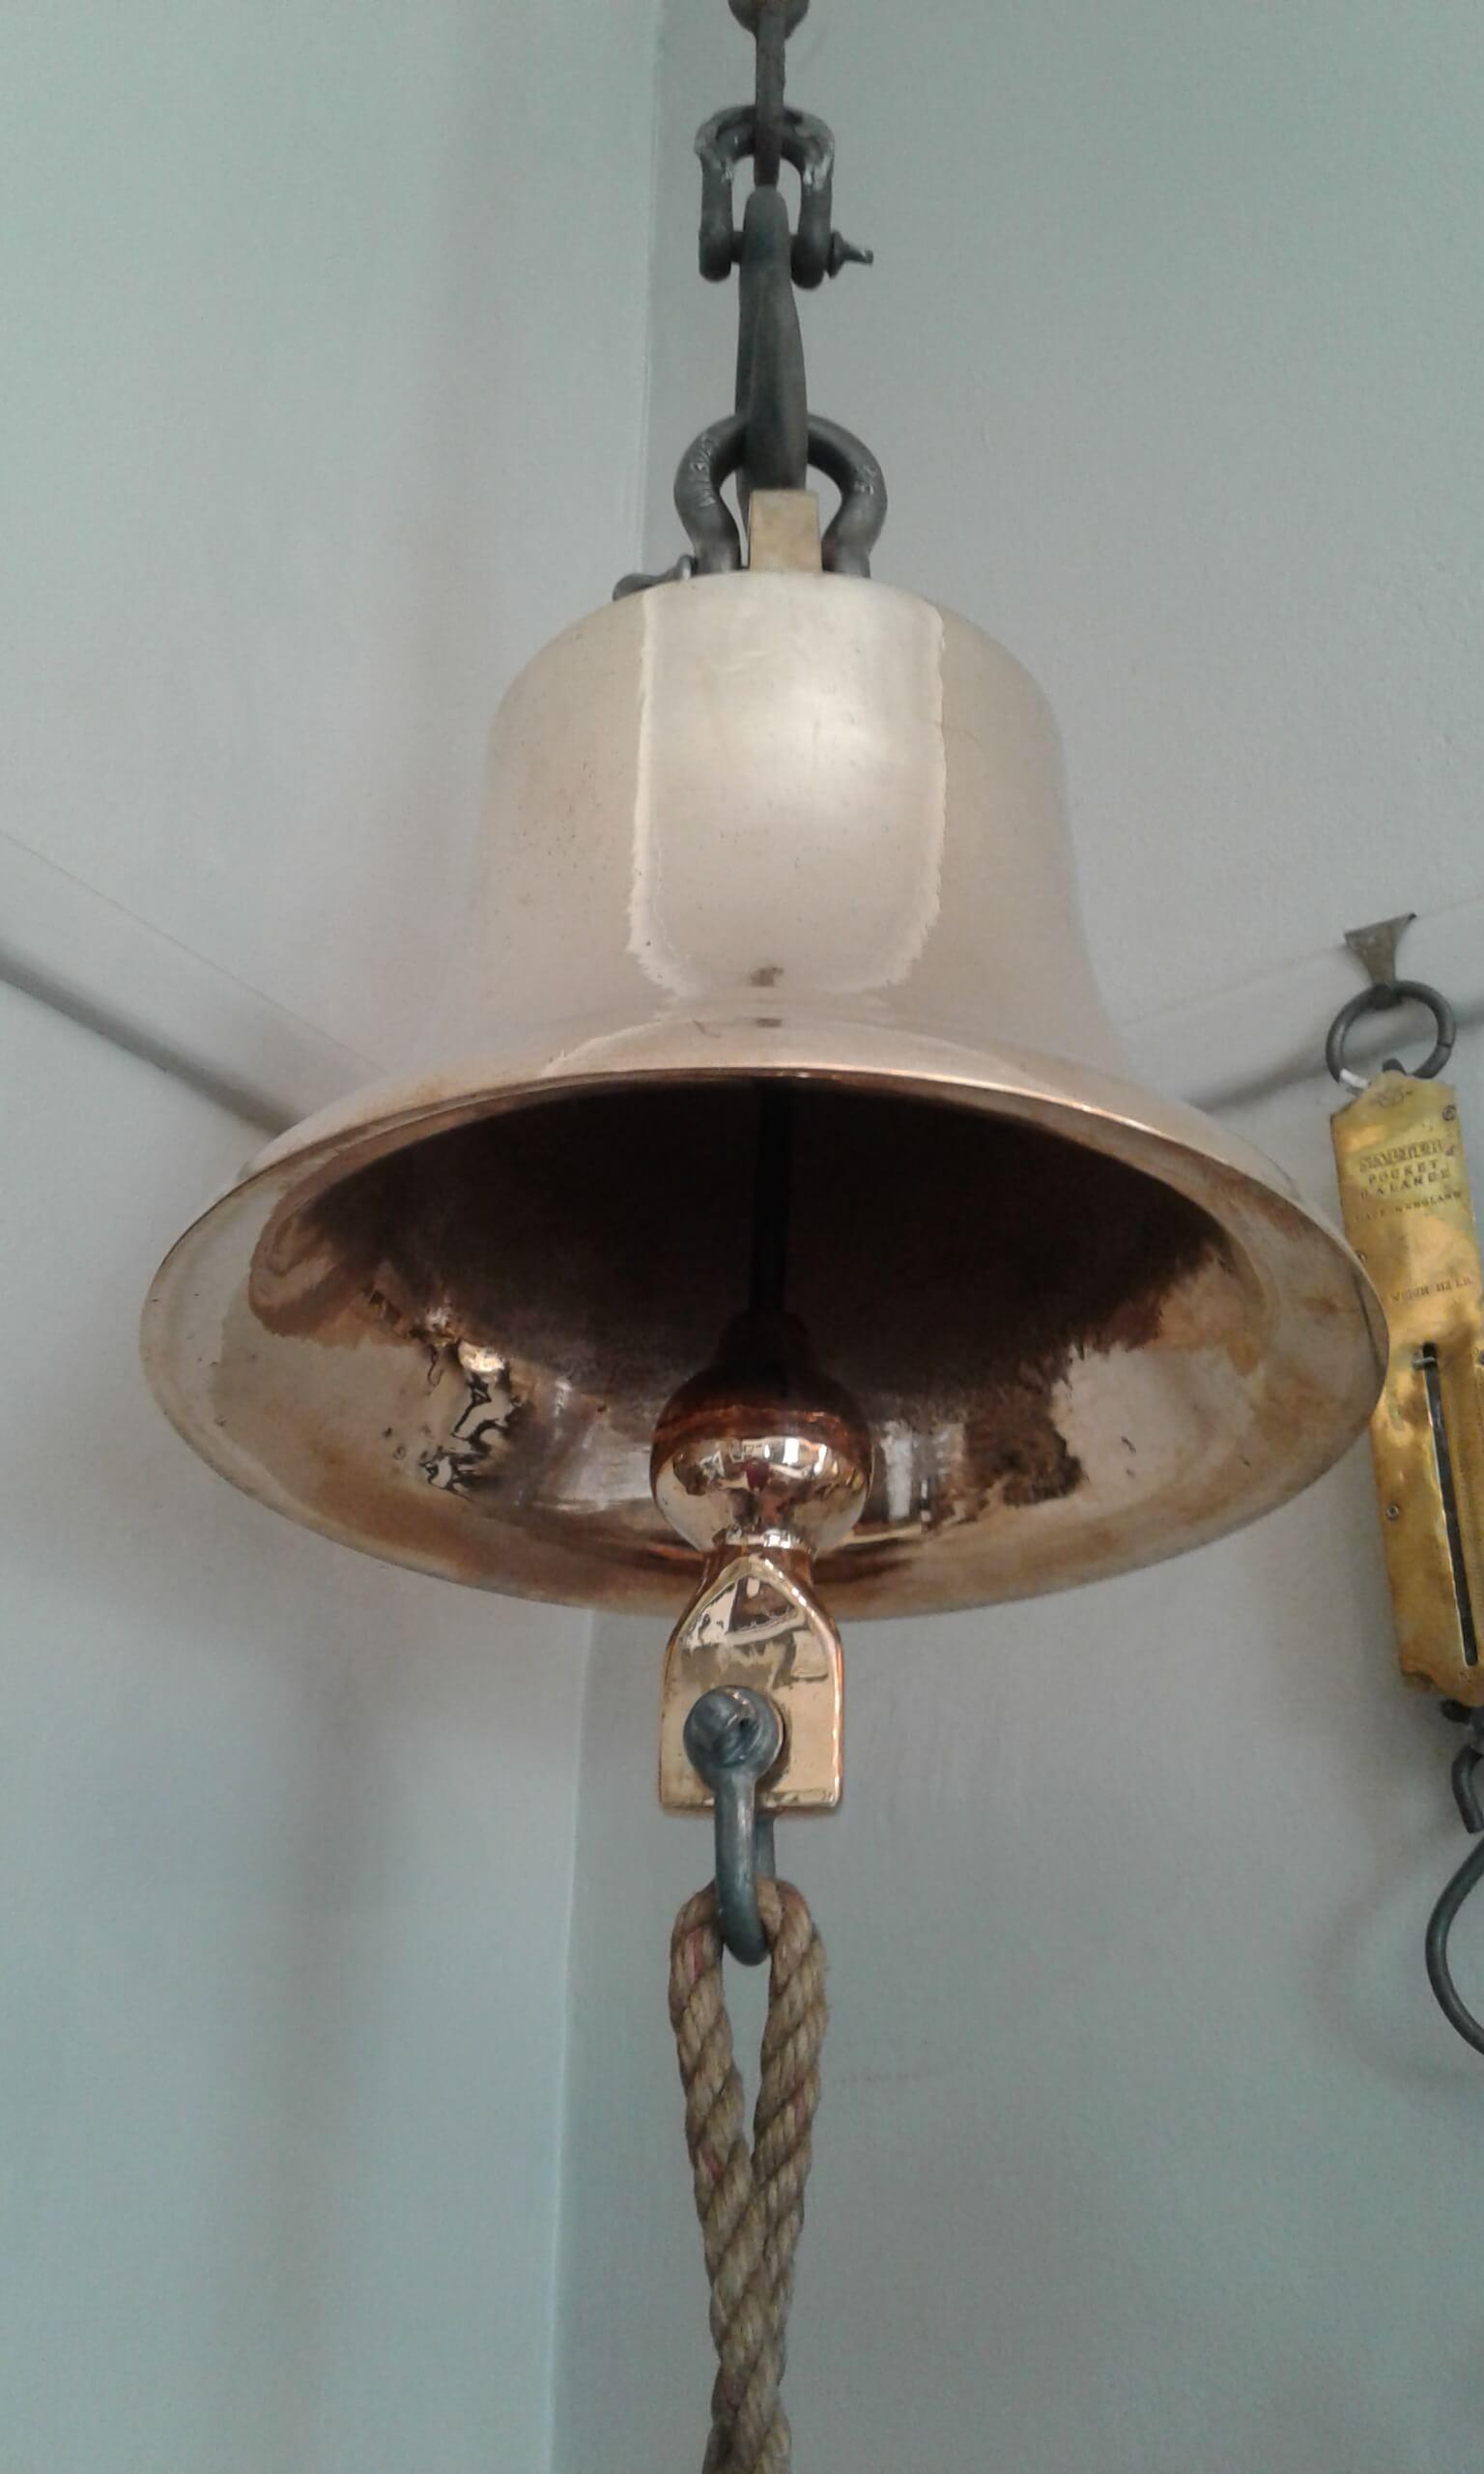 brassship's-bells